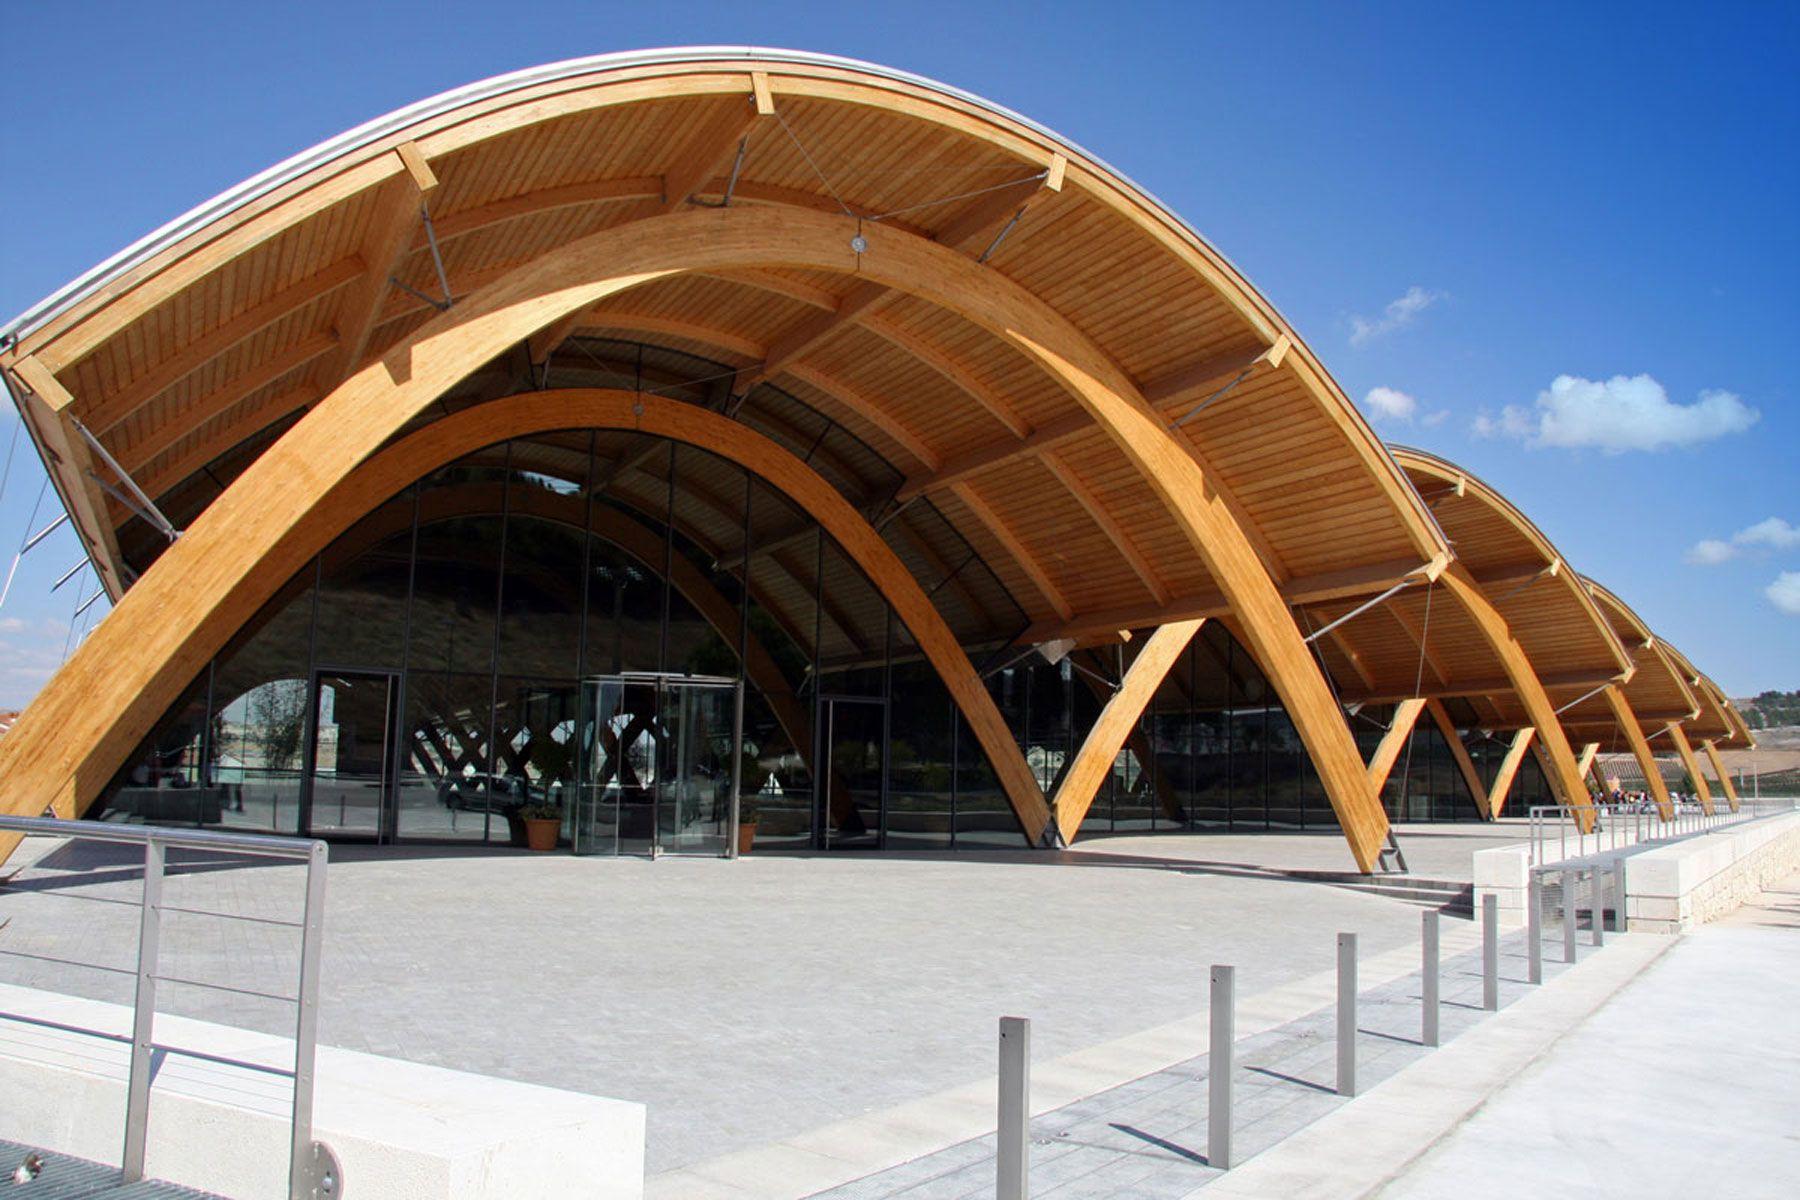 Estructuras de madera laminada buscar con google arq - Estructura madera laminada ...